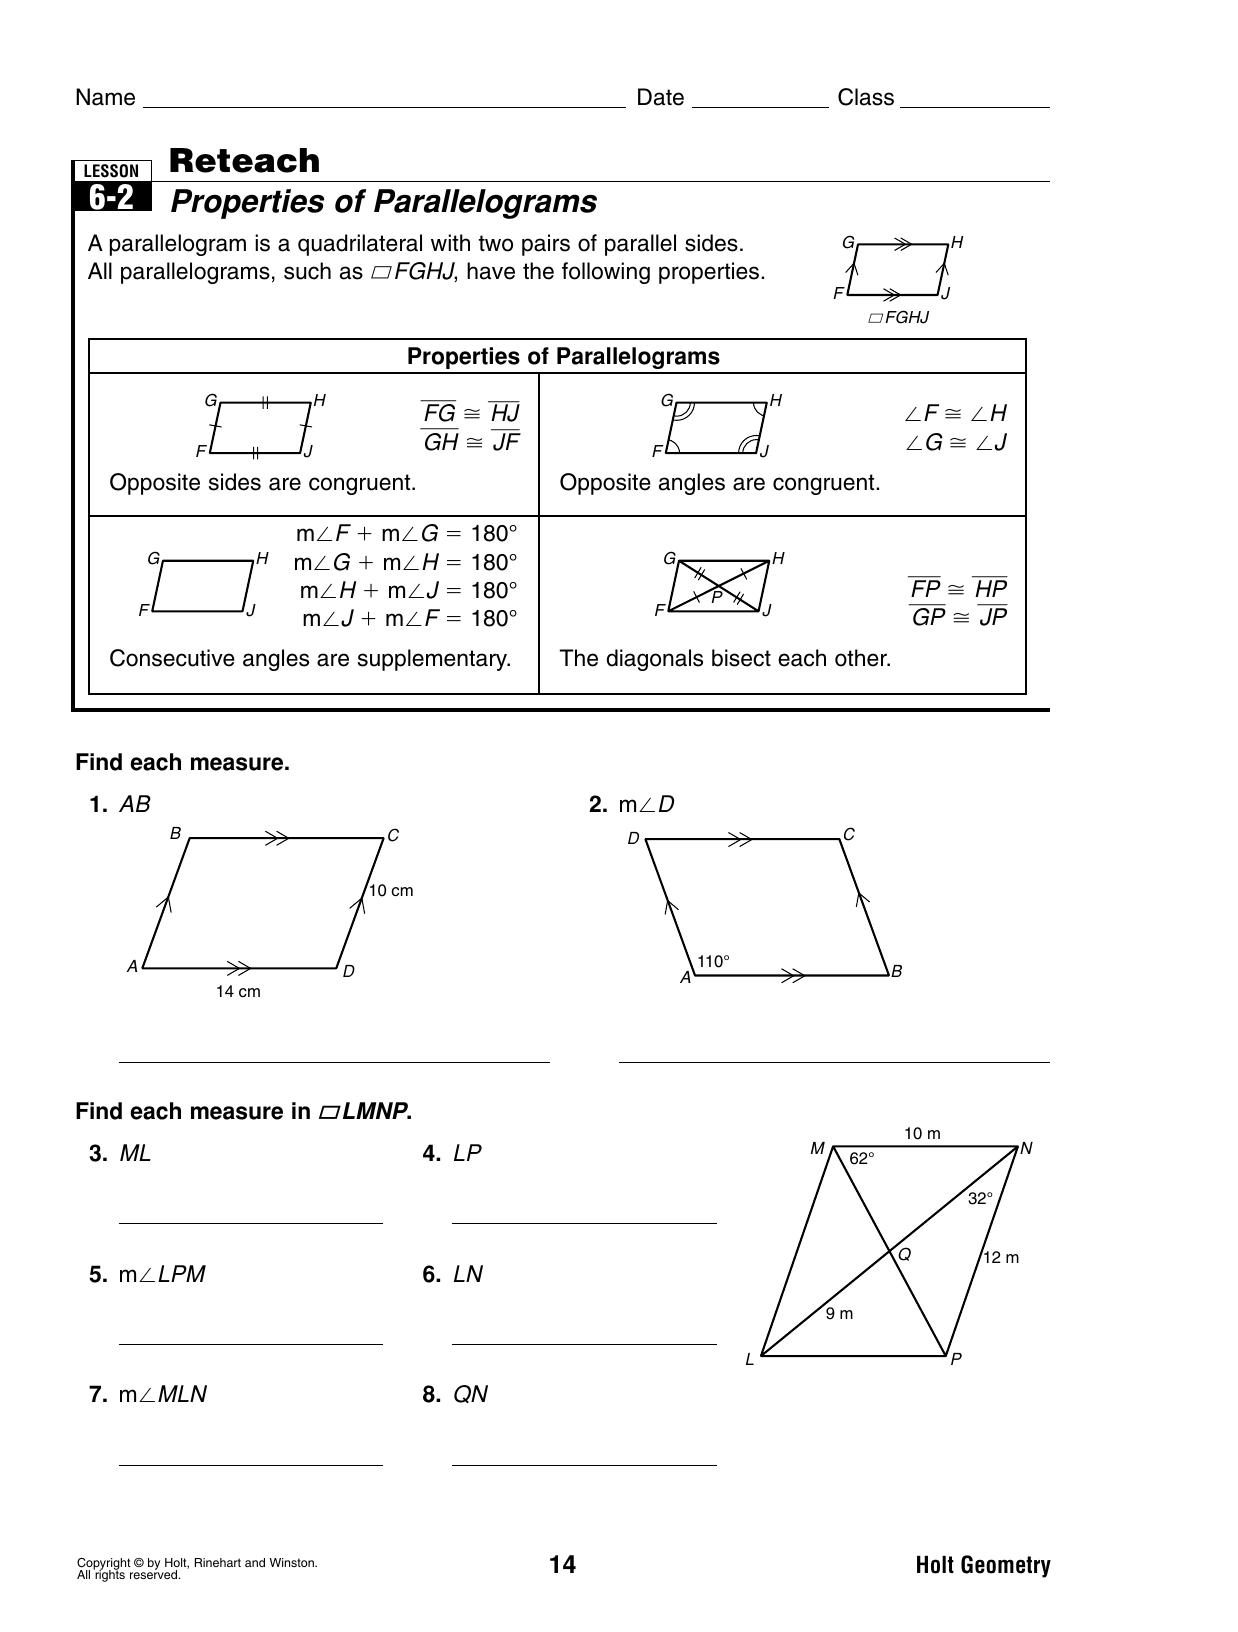 62 Reteach Properties Of Parallelograms — db excel.com